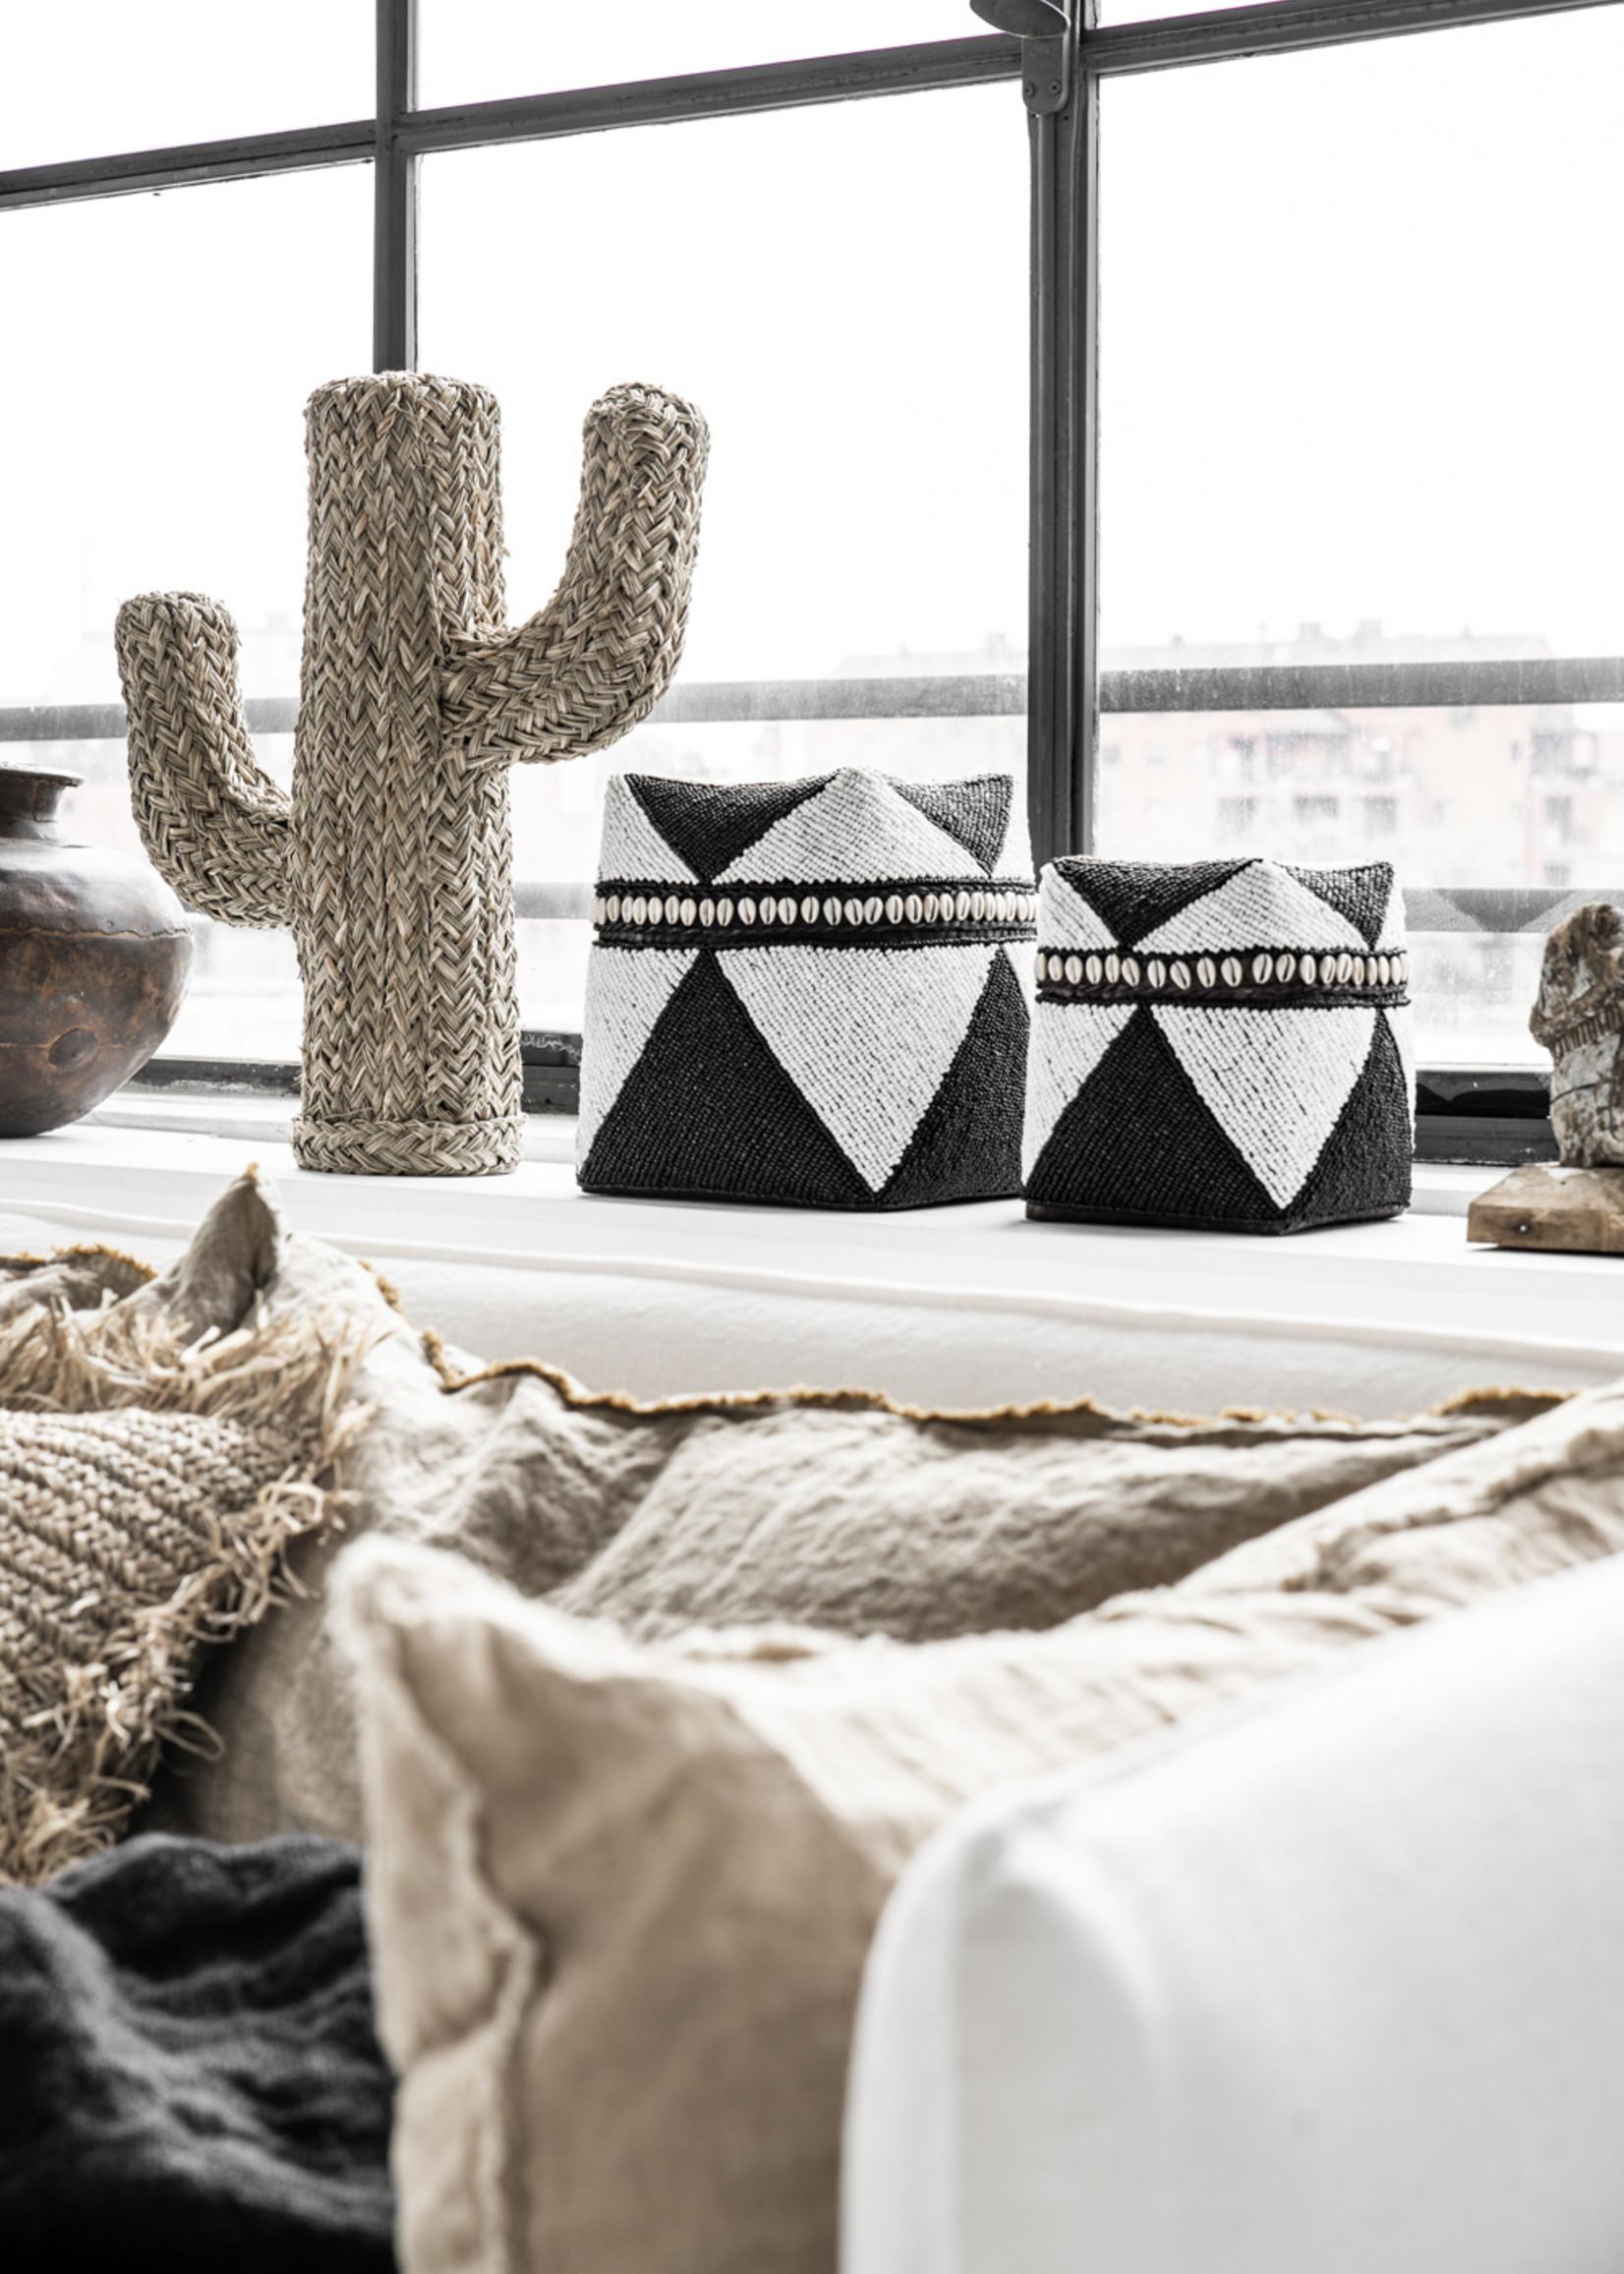 The Beaded Basket Cowrie Diamond High - Black White - M